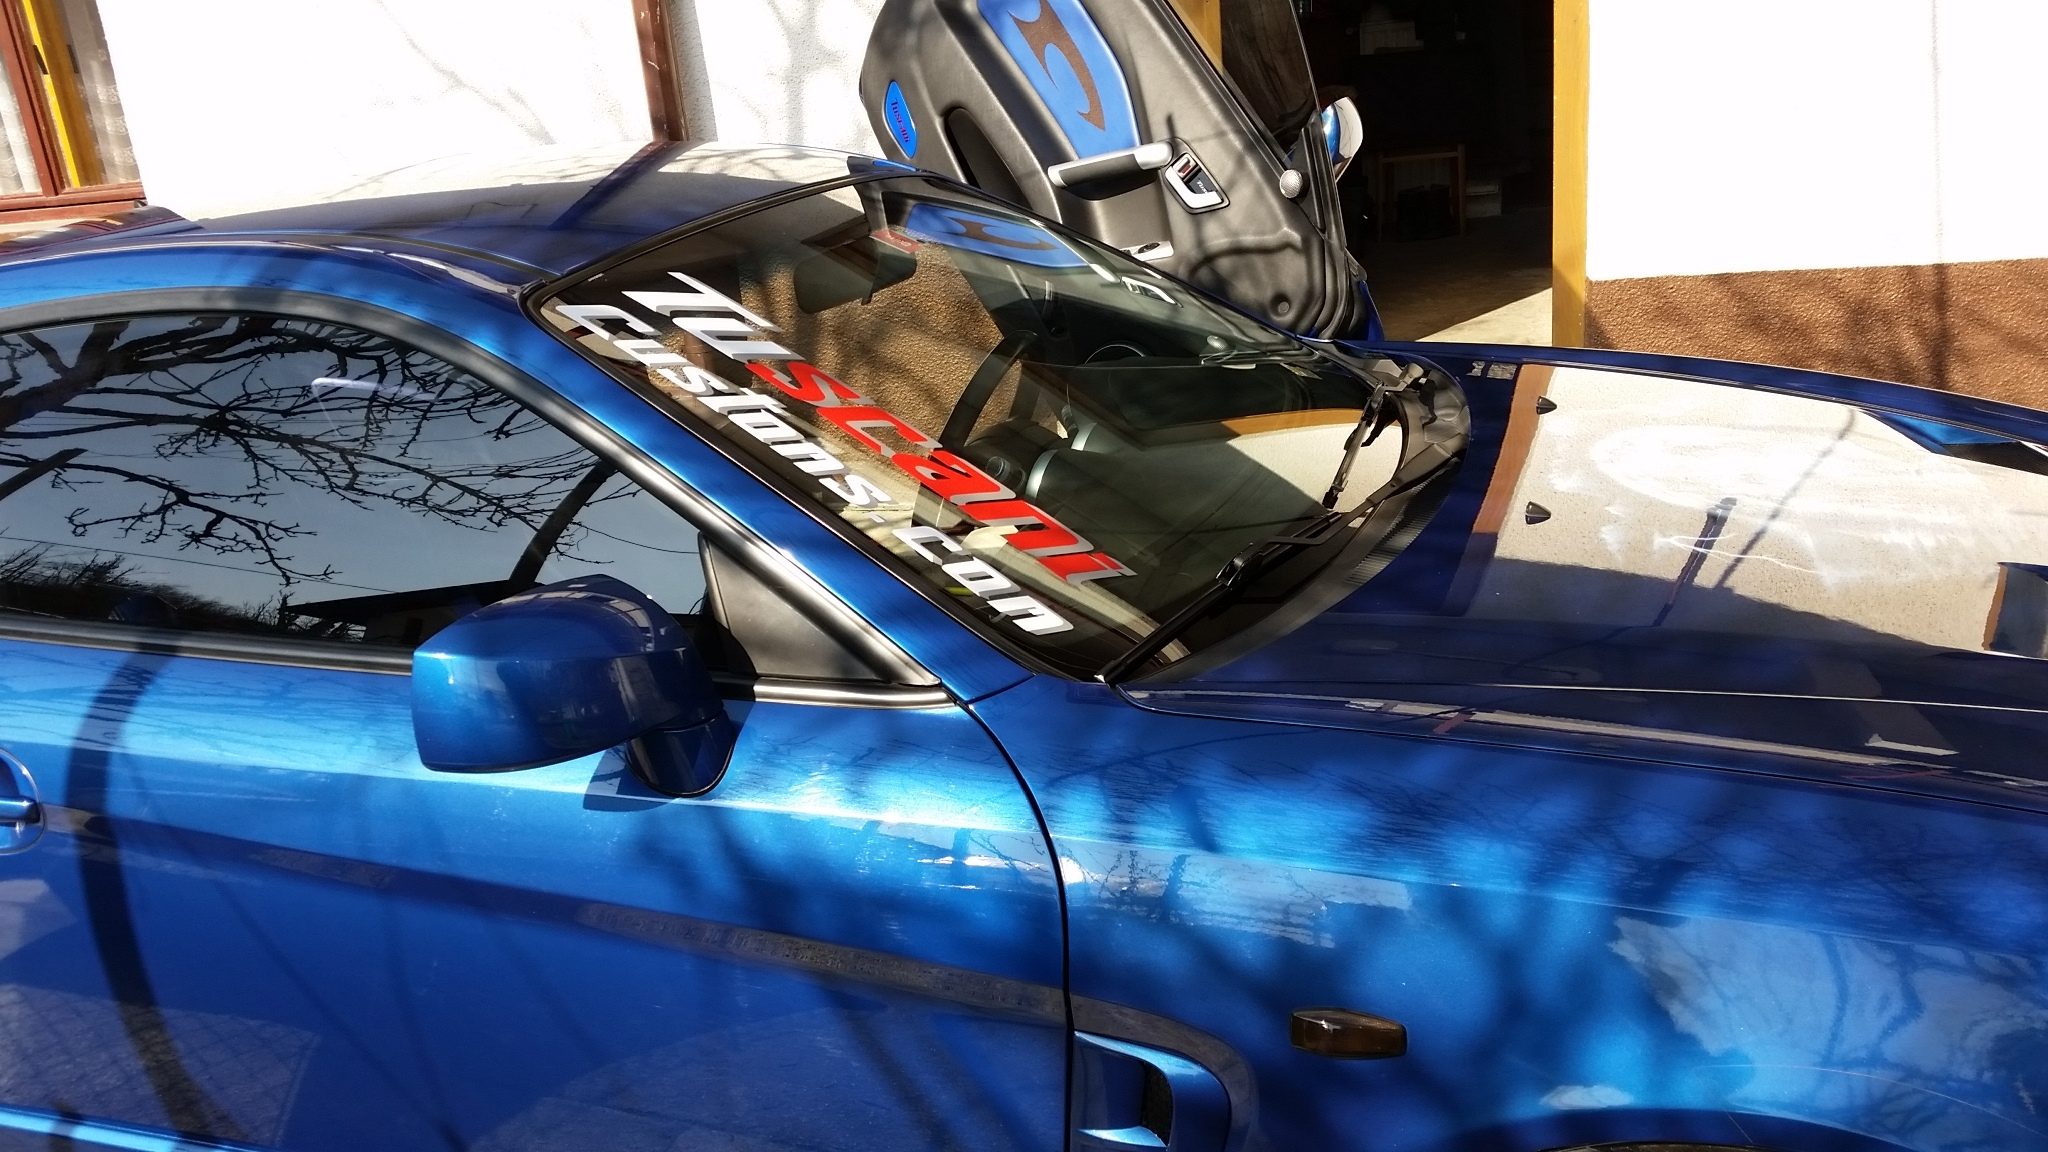 Ins2 Borkum Wandattoo Car Sticker Island 10 cm